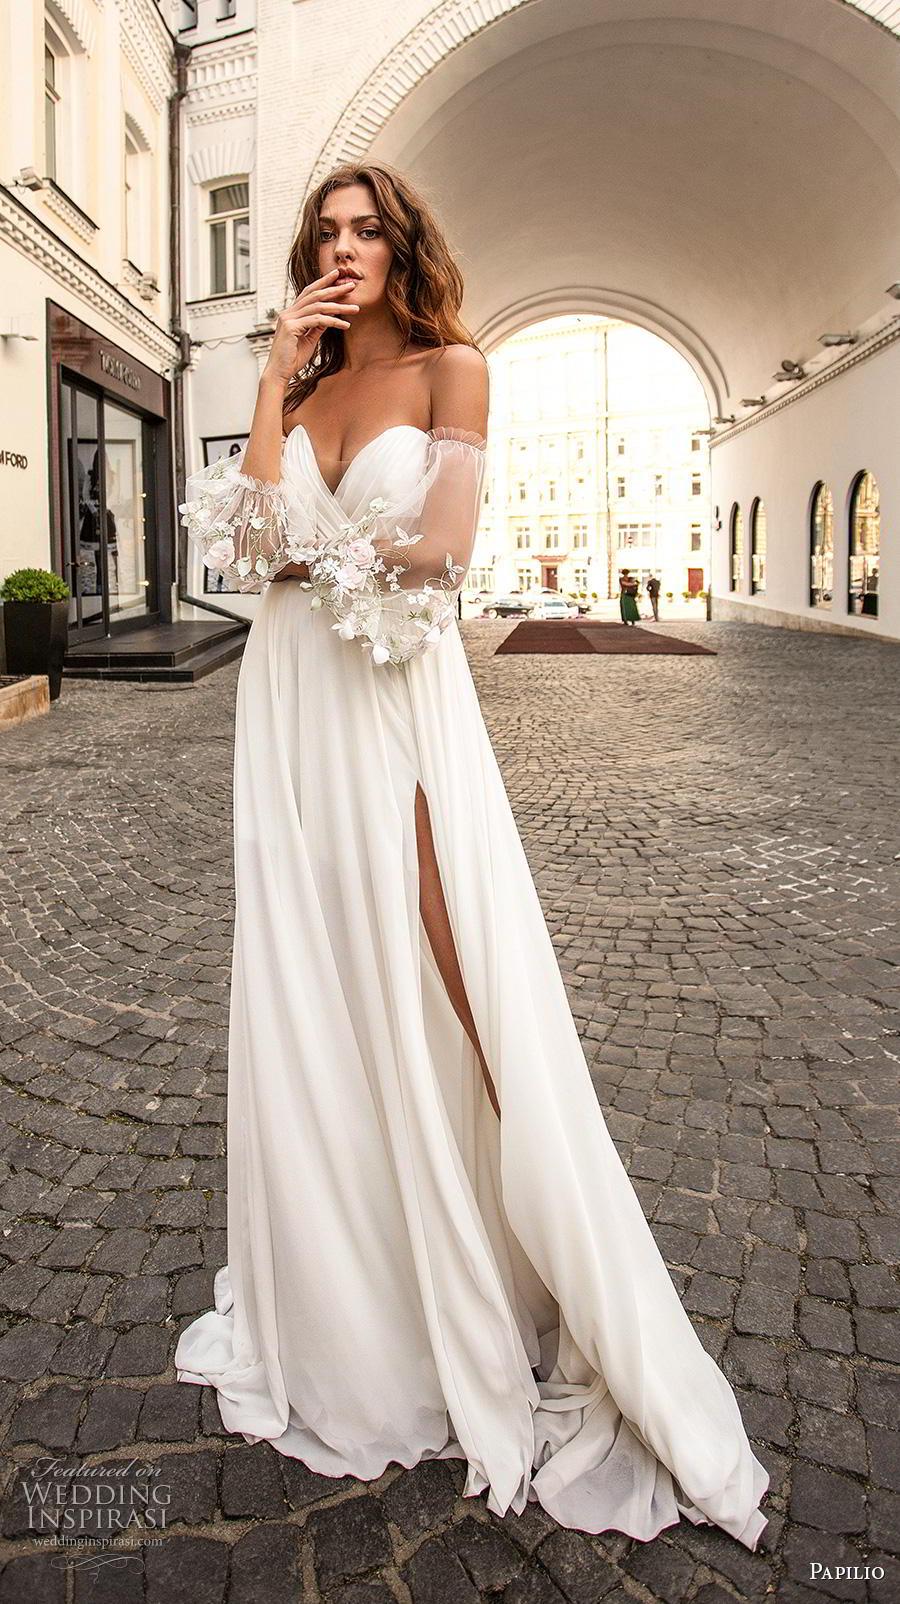 papilio 2019 bridal long bishop sleeves off the shoulder sweetheart neckline wrap over ruched bodice slit skirt romantic a  line wedding dress medium train (1) mv